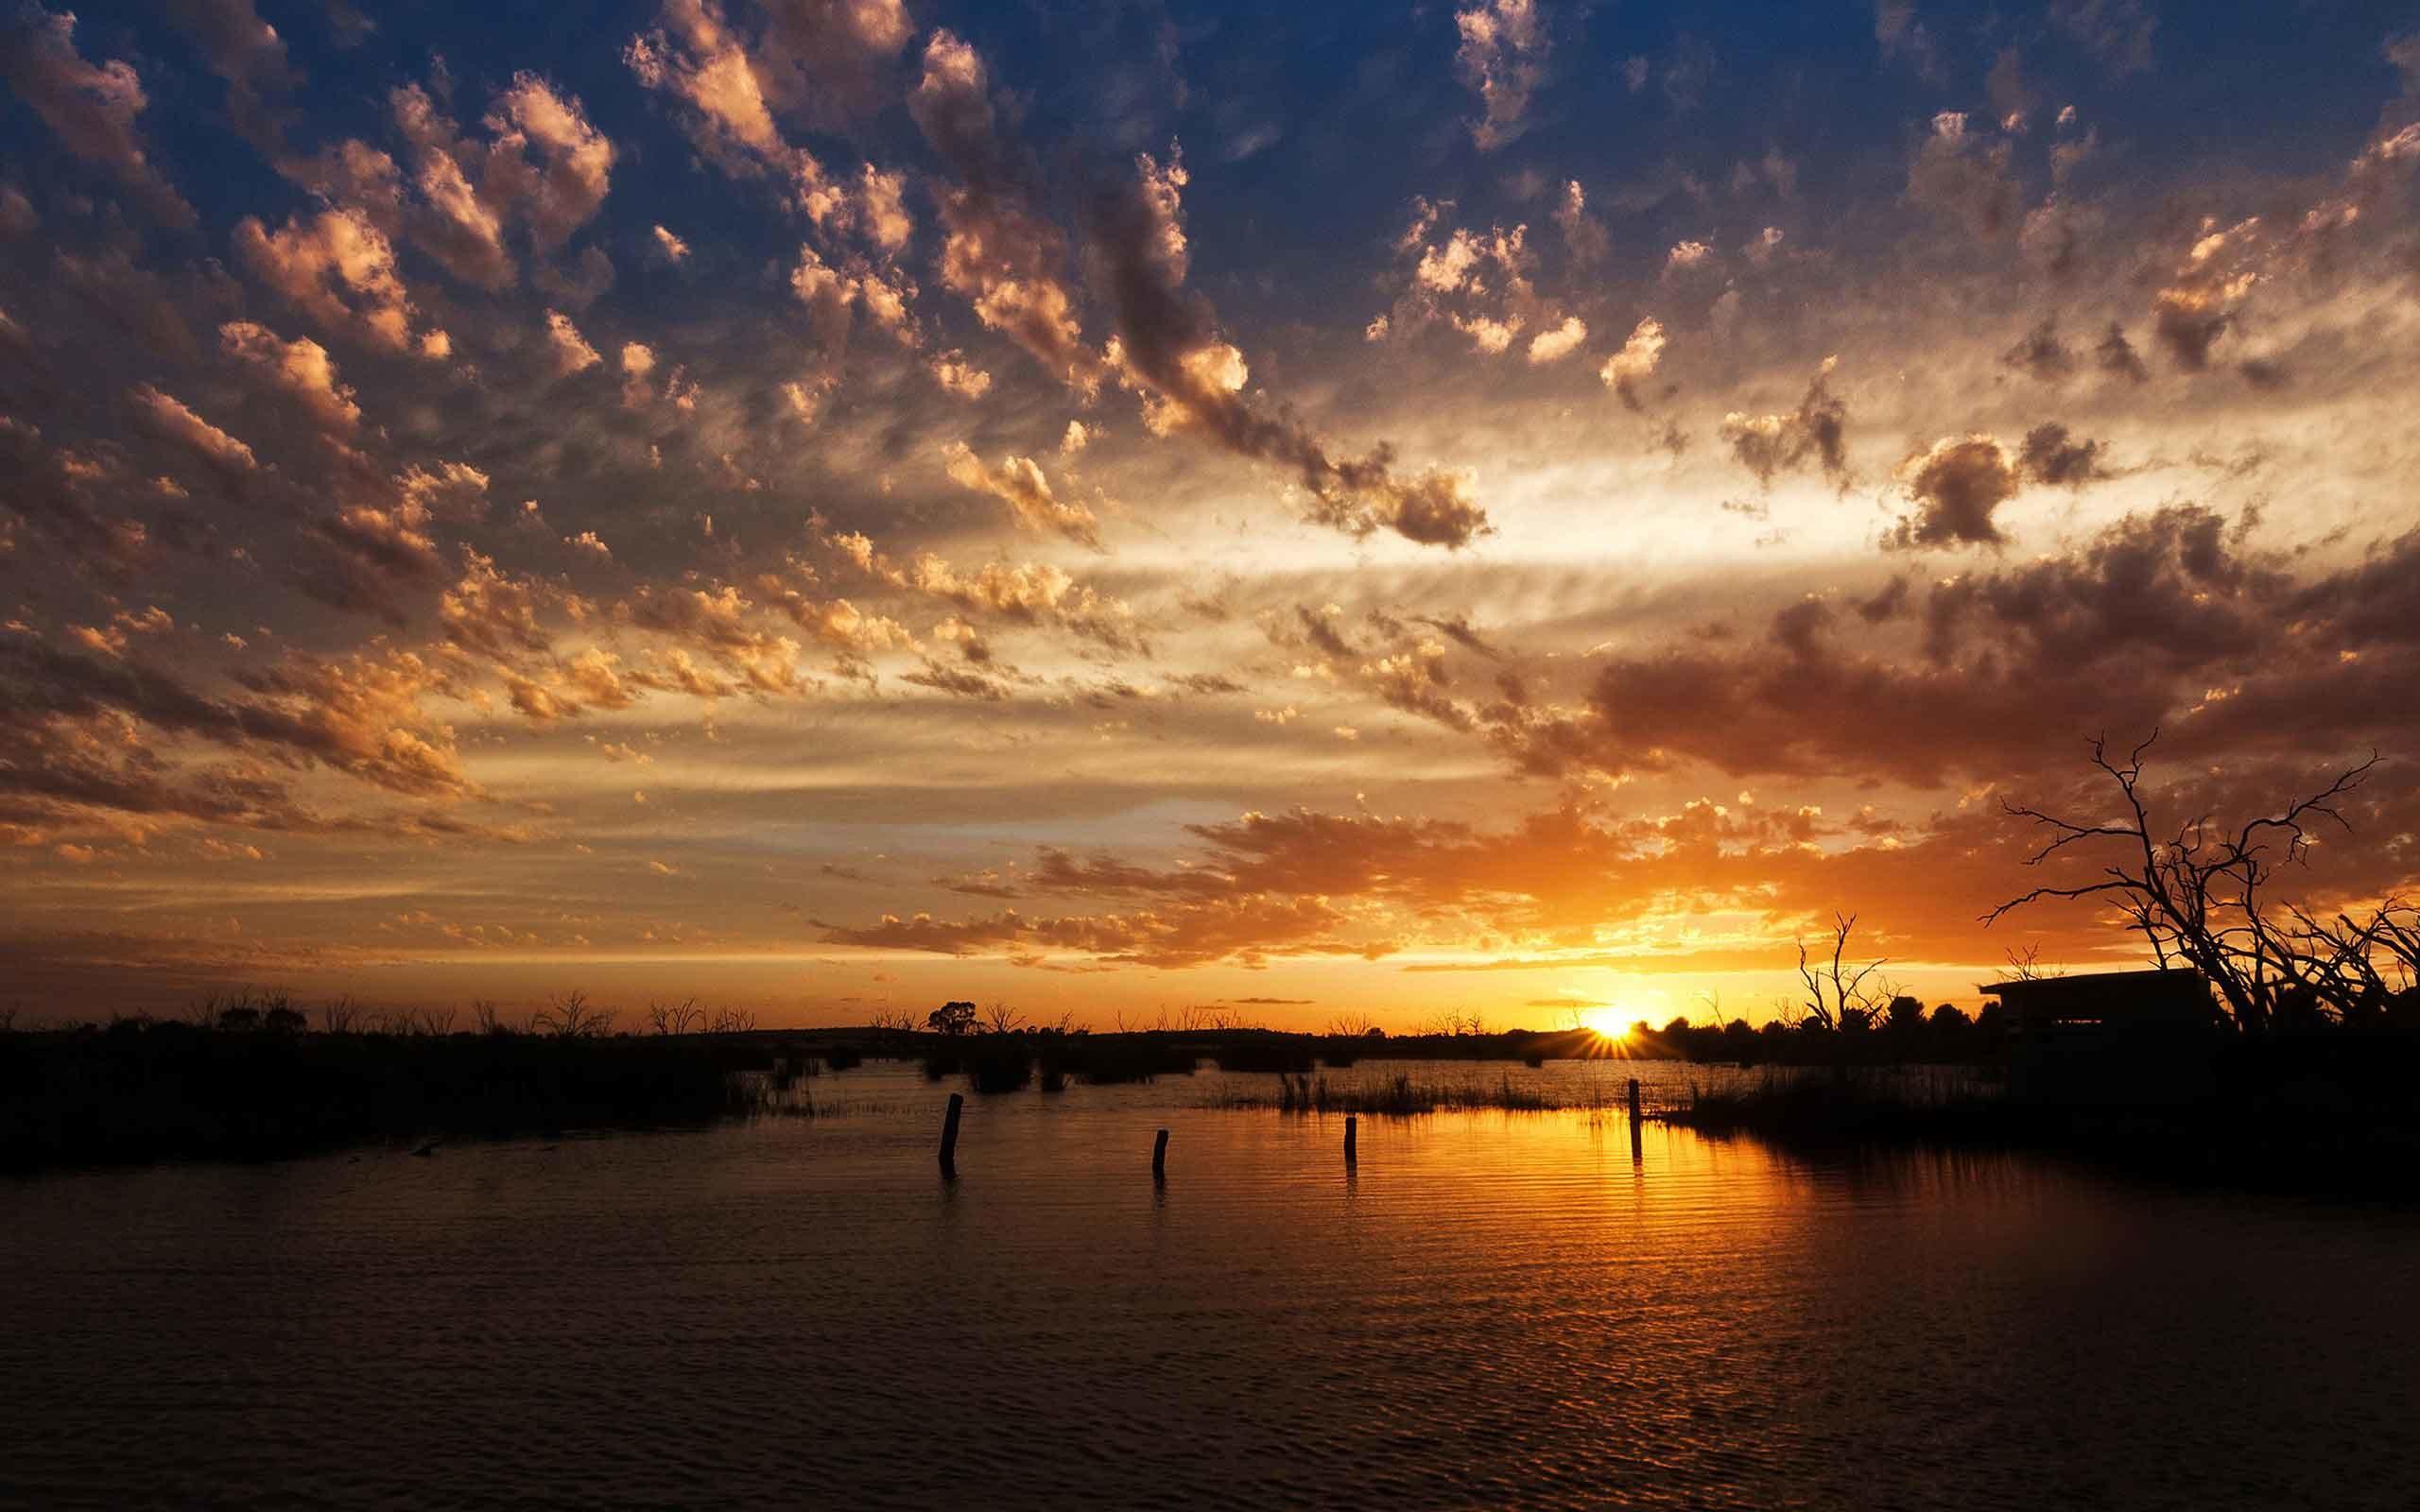 Sunrise Sunset Sunlight Nature Screensavers For Desktop Free Download